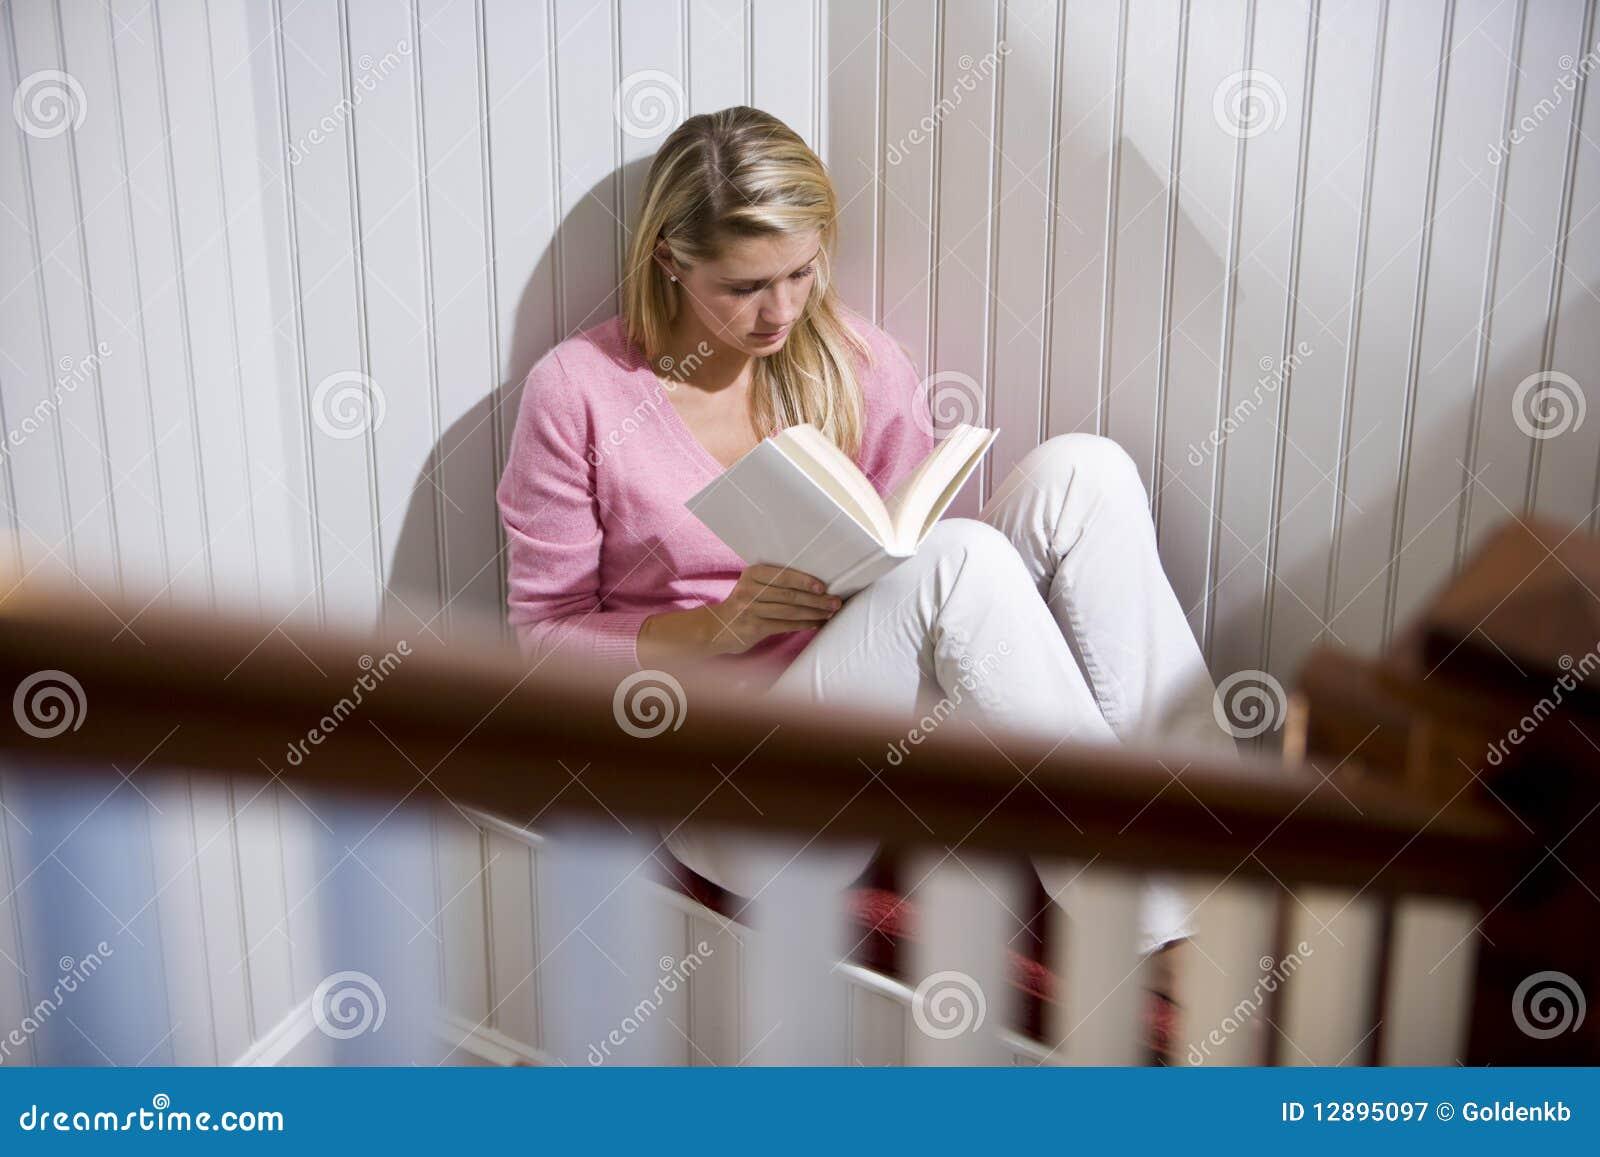 Teenage girl reading alone in quiet corner